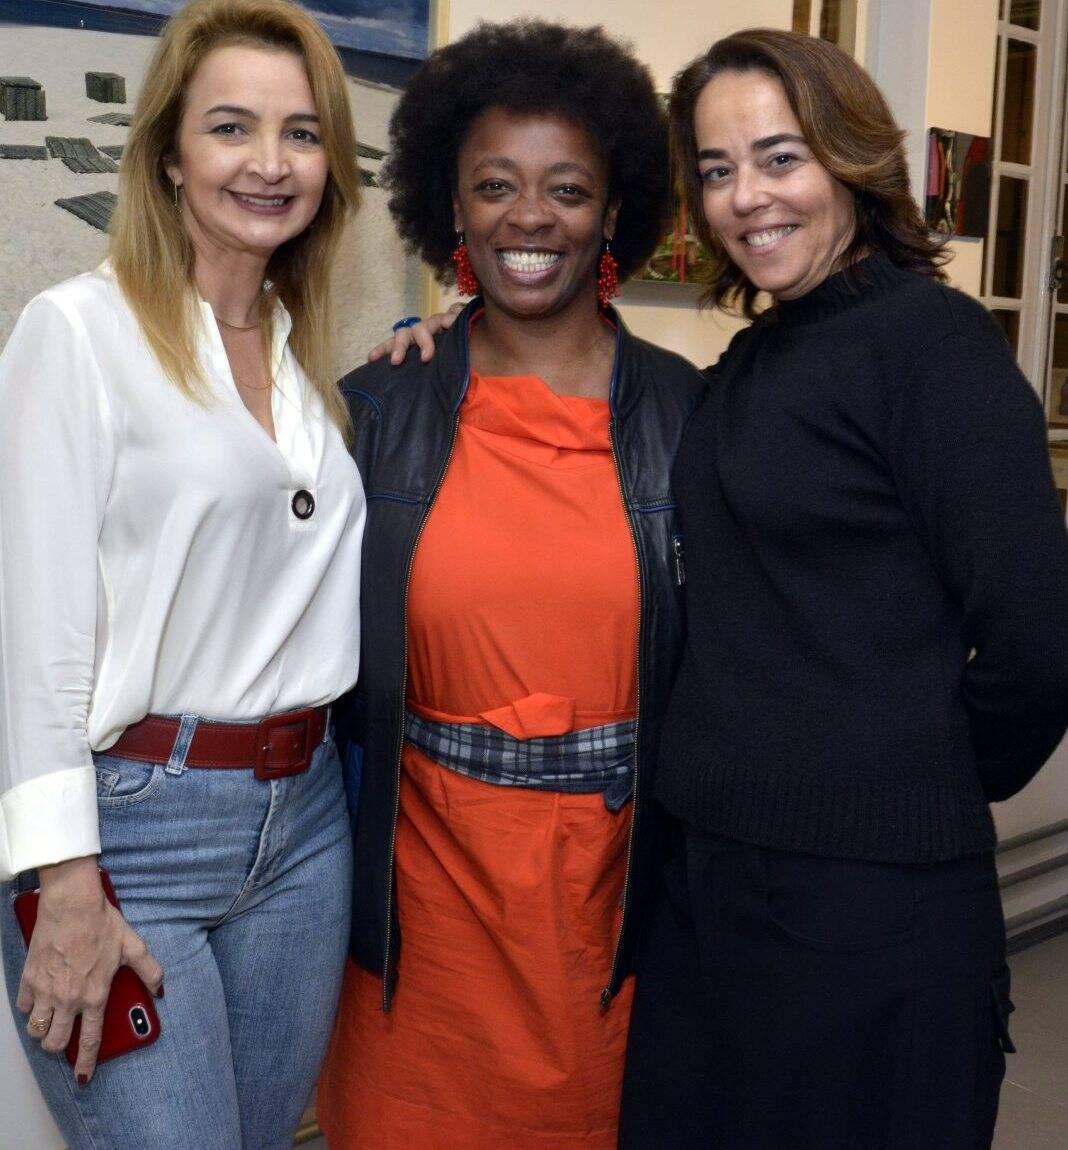 Simone Cadinelli, Keyna Eleison e Ursula Tautz   - Fotos: Cristina Granato